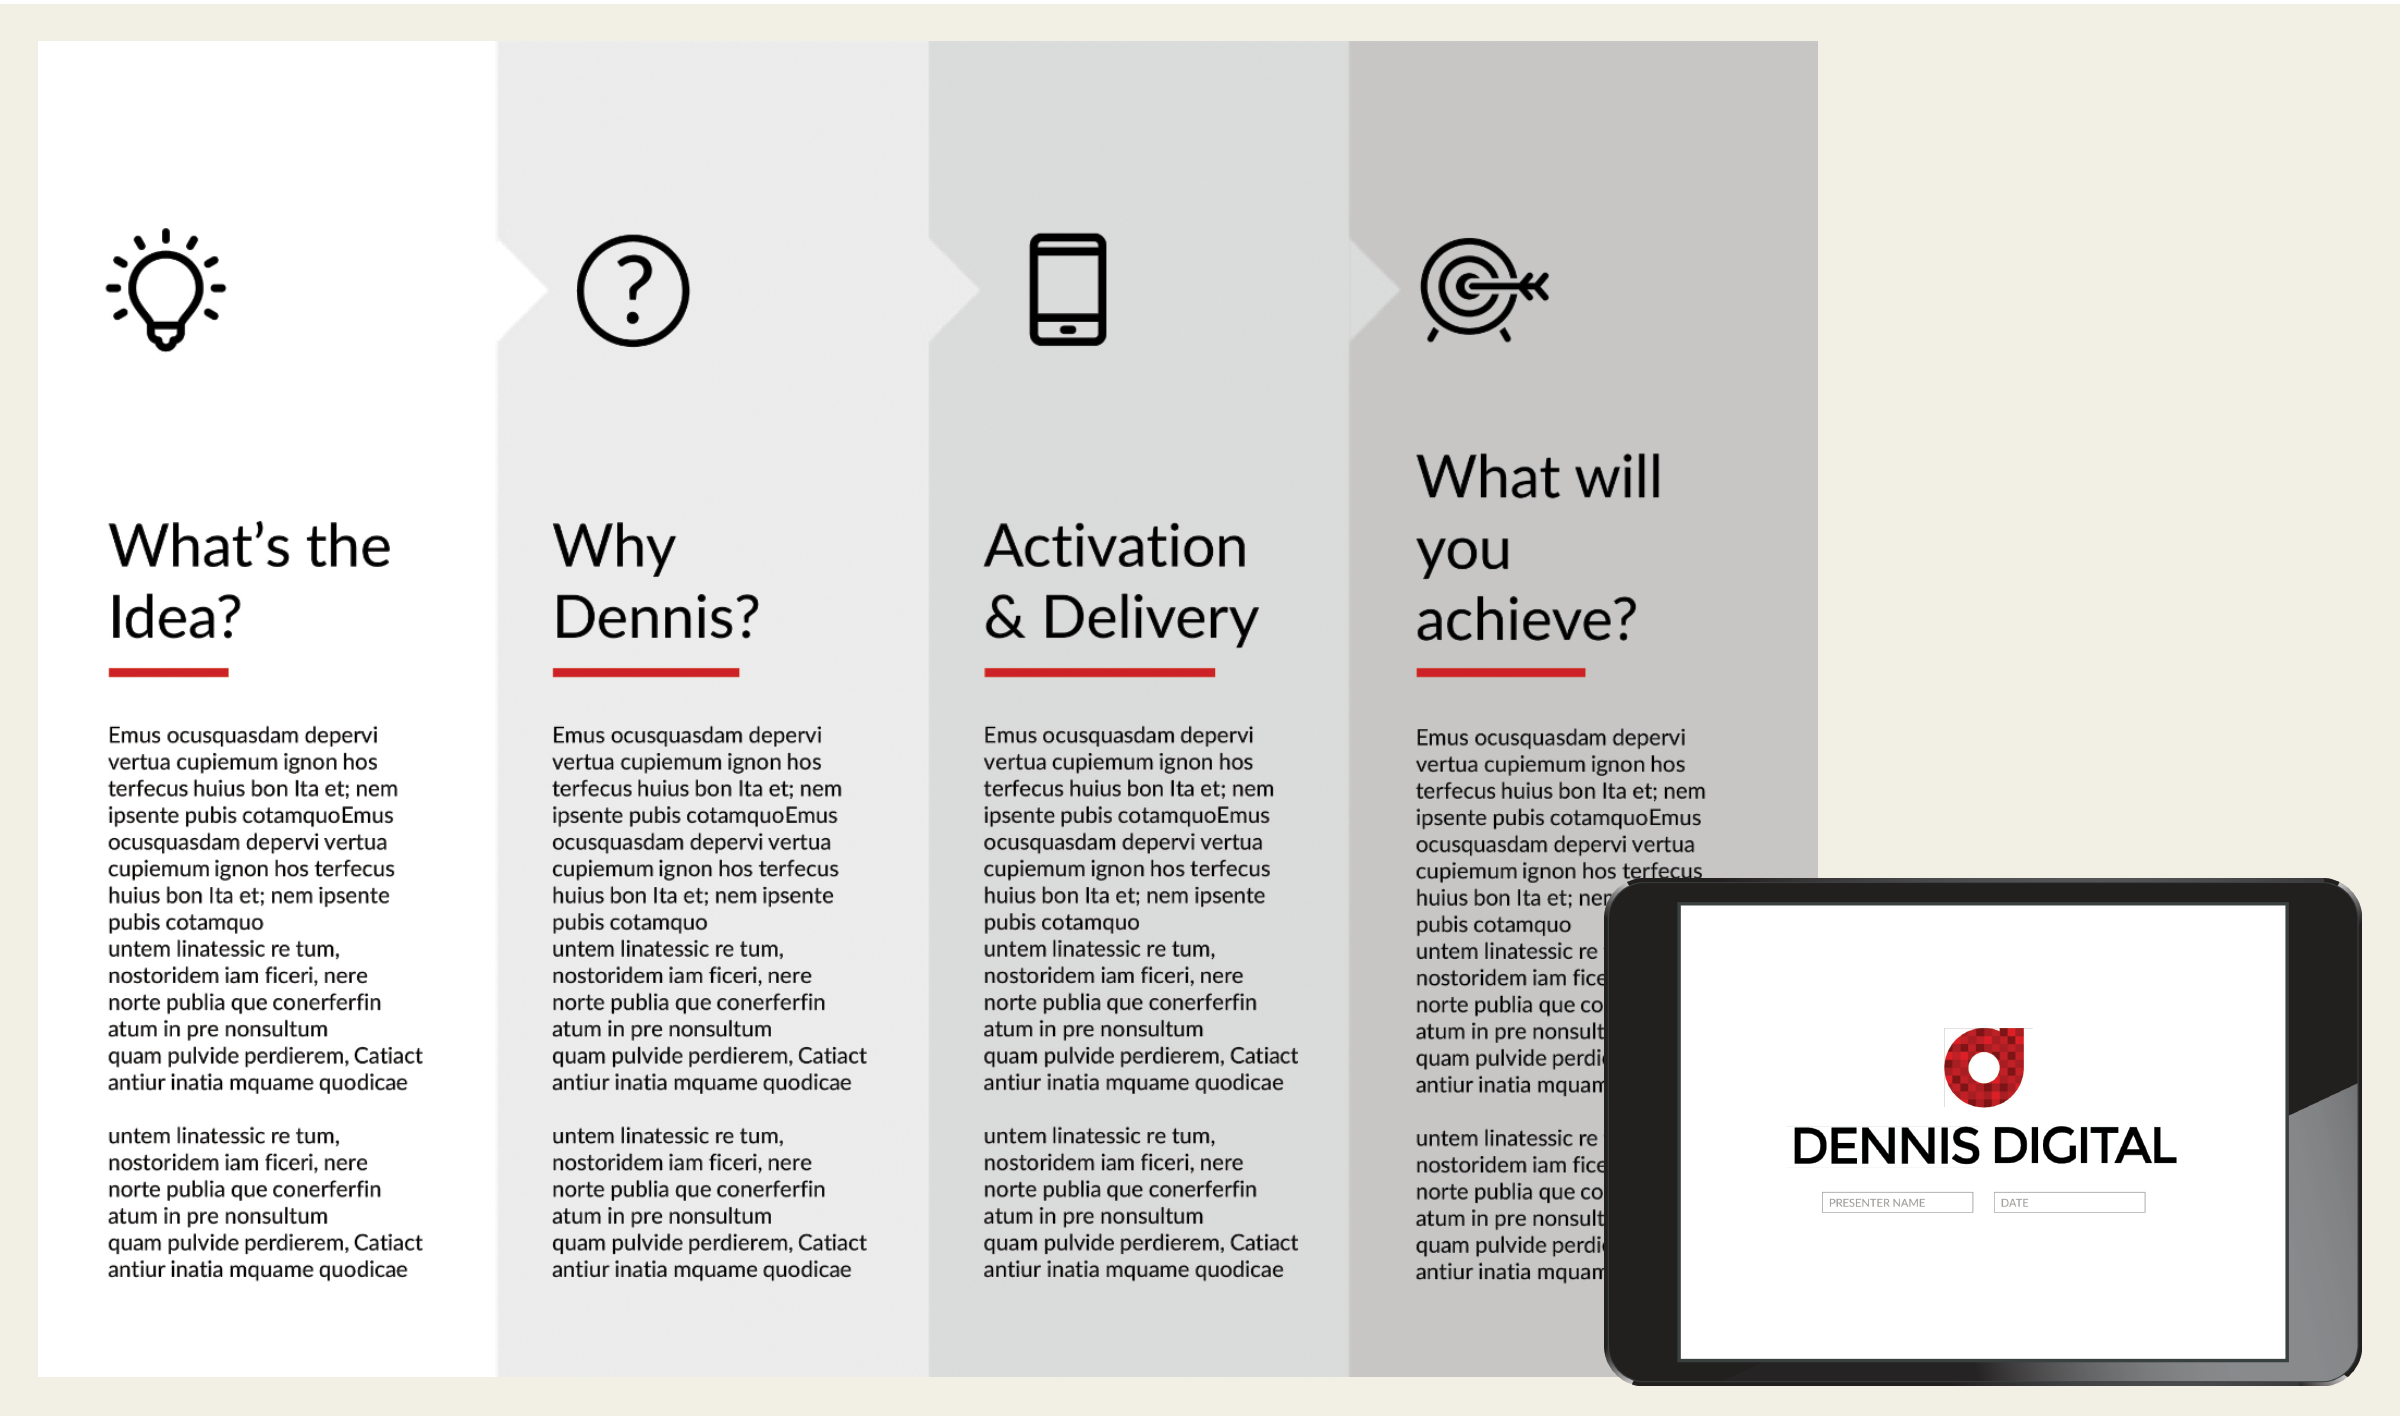 Dennis digital deck